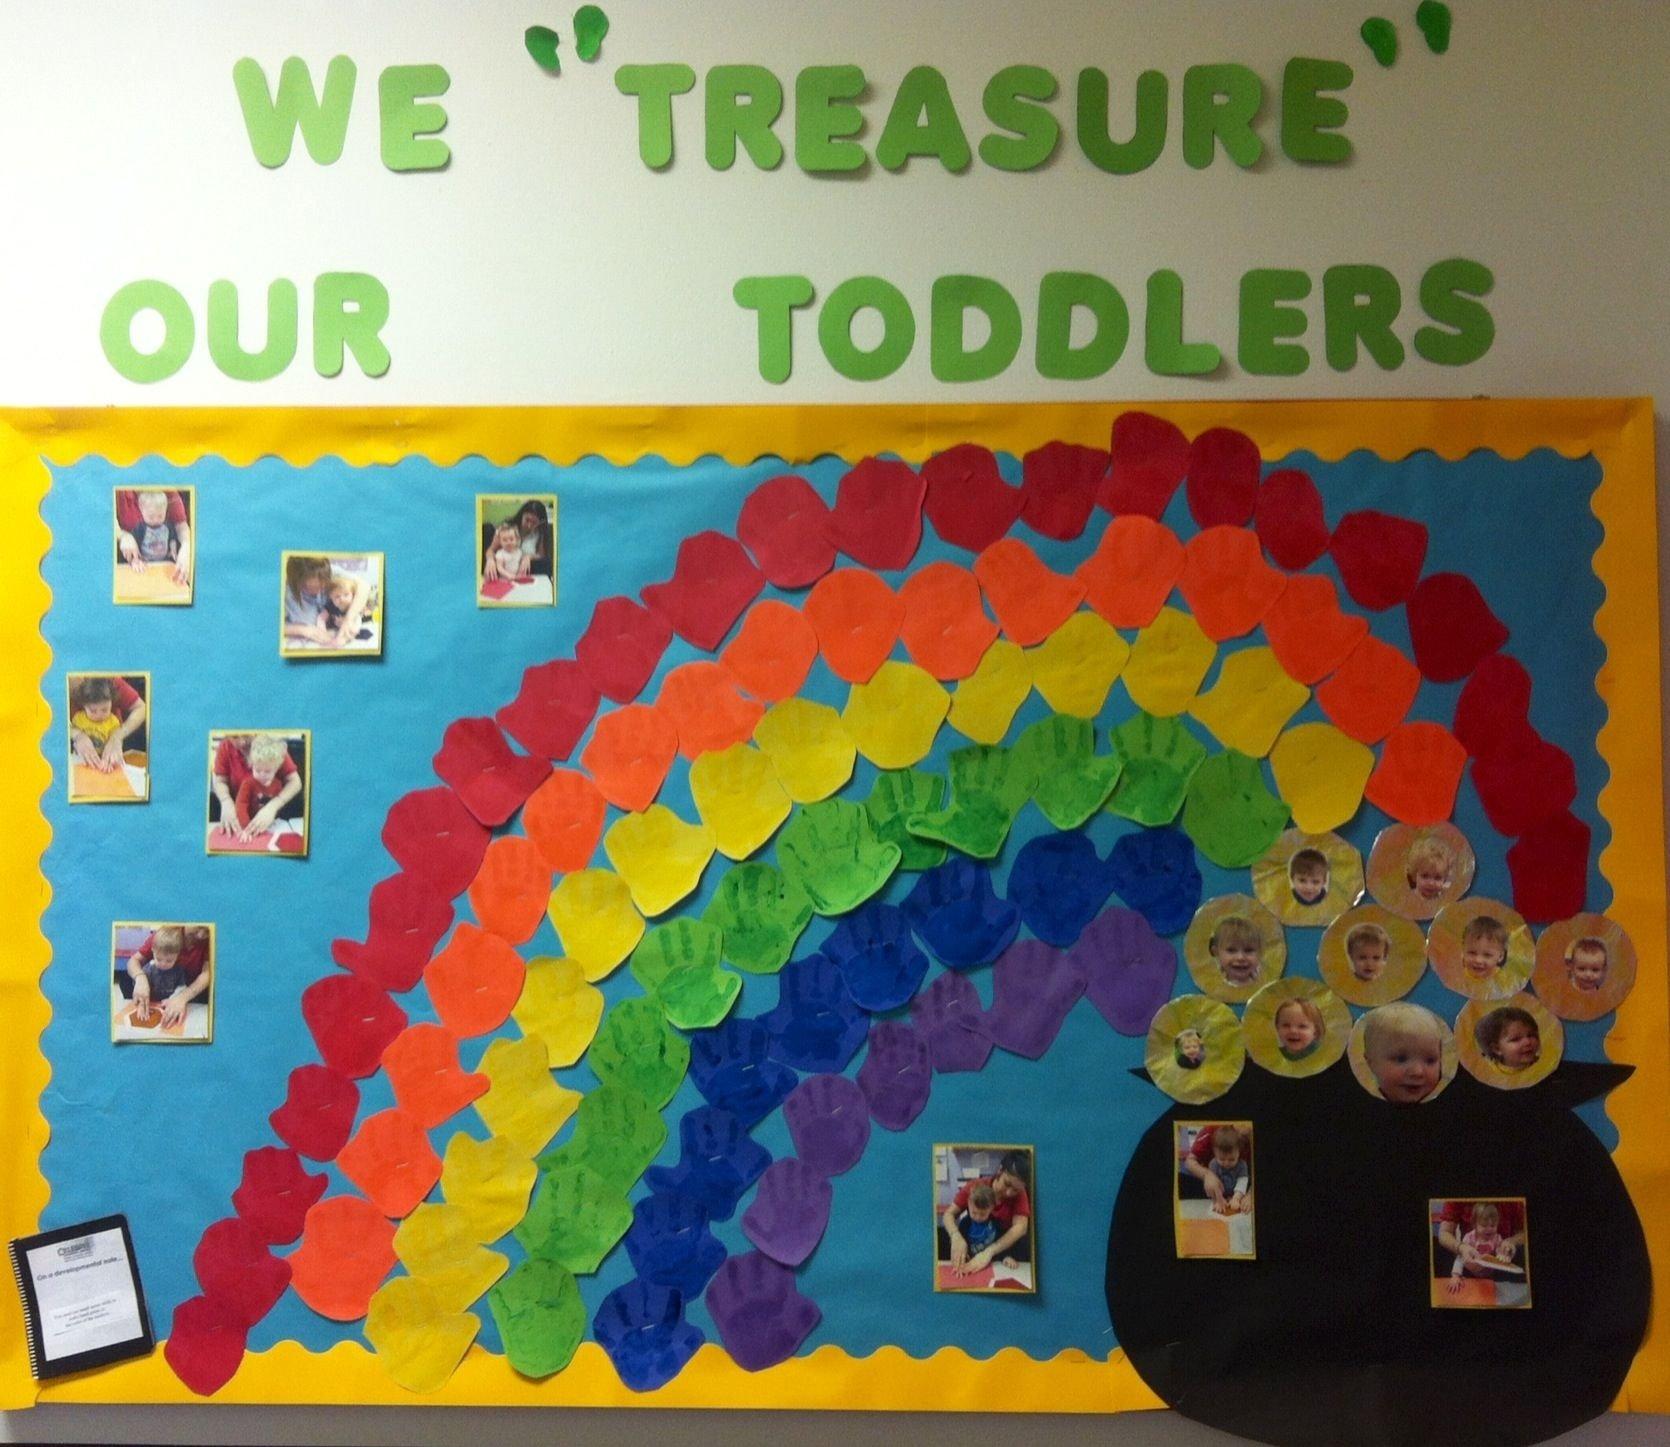 10 Amazing St Patrick Day Bulletin Board Ideas st patricks day bulletin board we treasure our toddlers